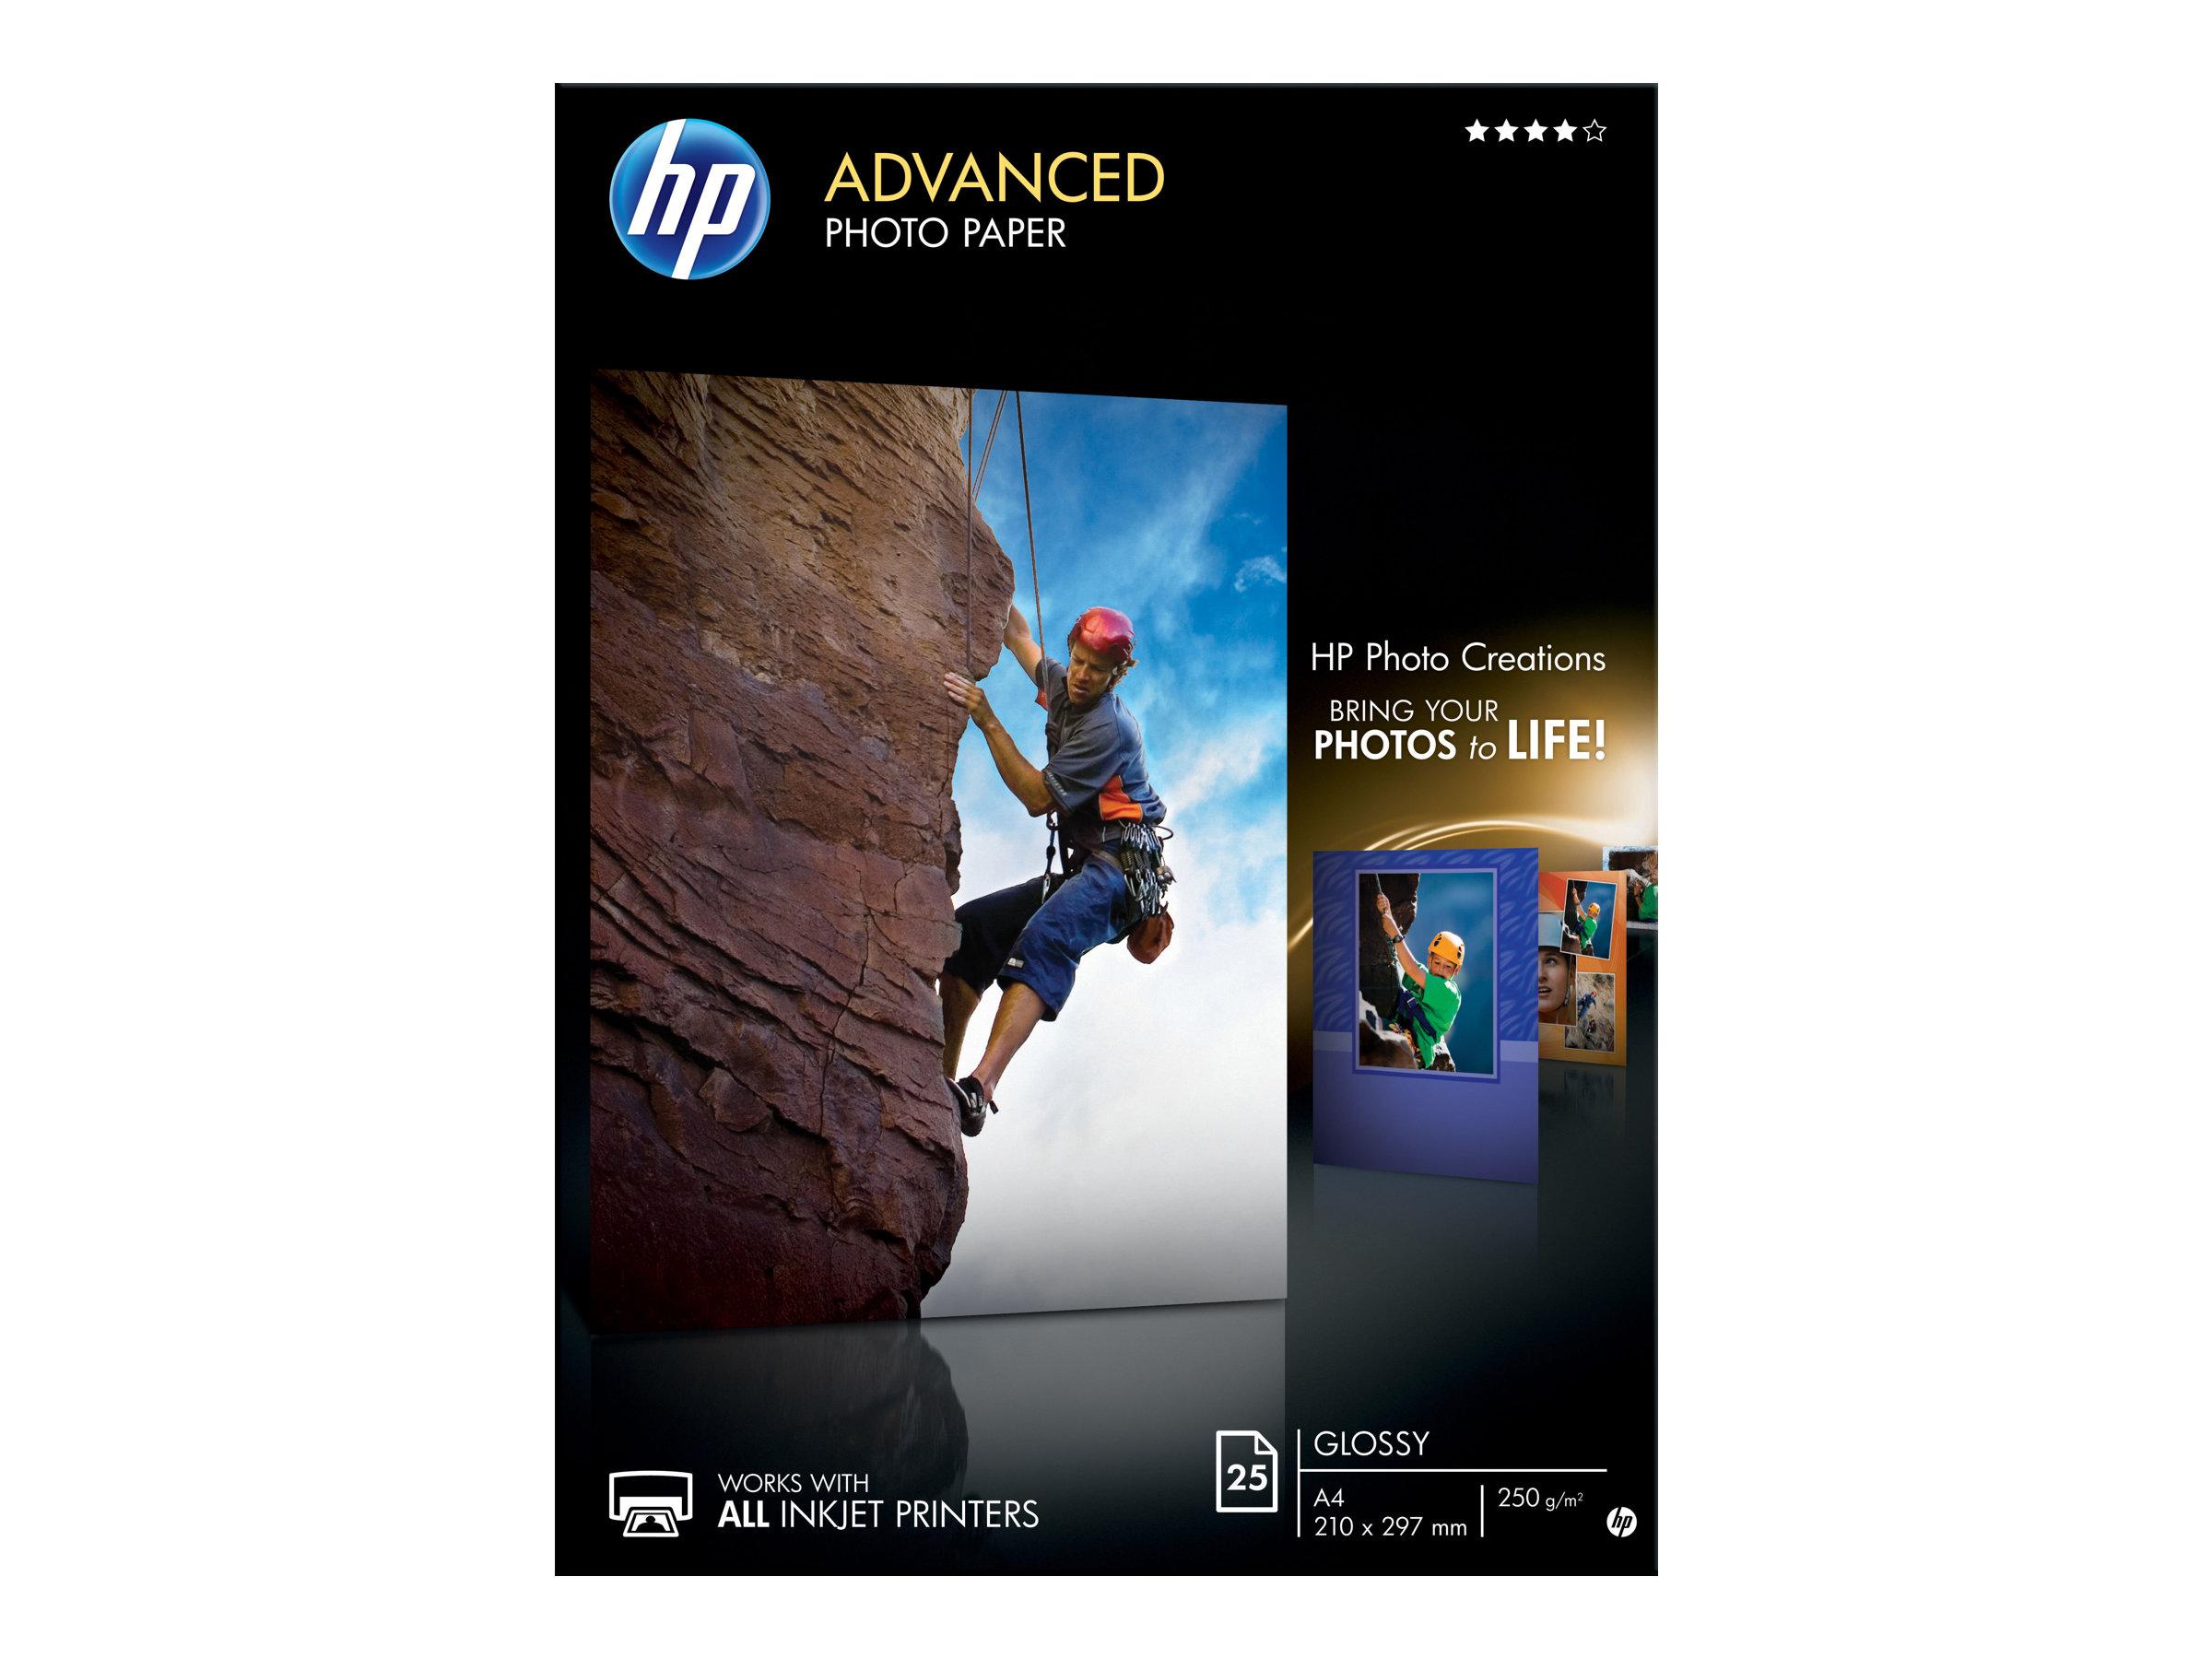 Hp advanced glossy photo paper glaenzend a4 210 x 297 mm 250 g m 25 blatt fotopapier fuer officejet 80xx photosmart b110 wireless b110 smart tank plus 55x 571 655 19509 q5456a